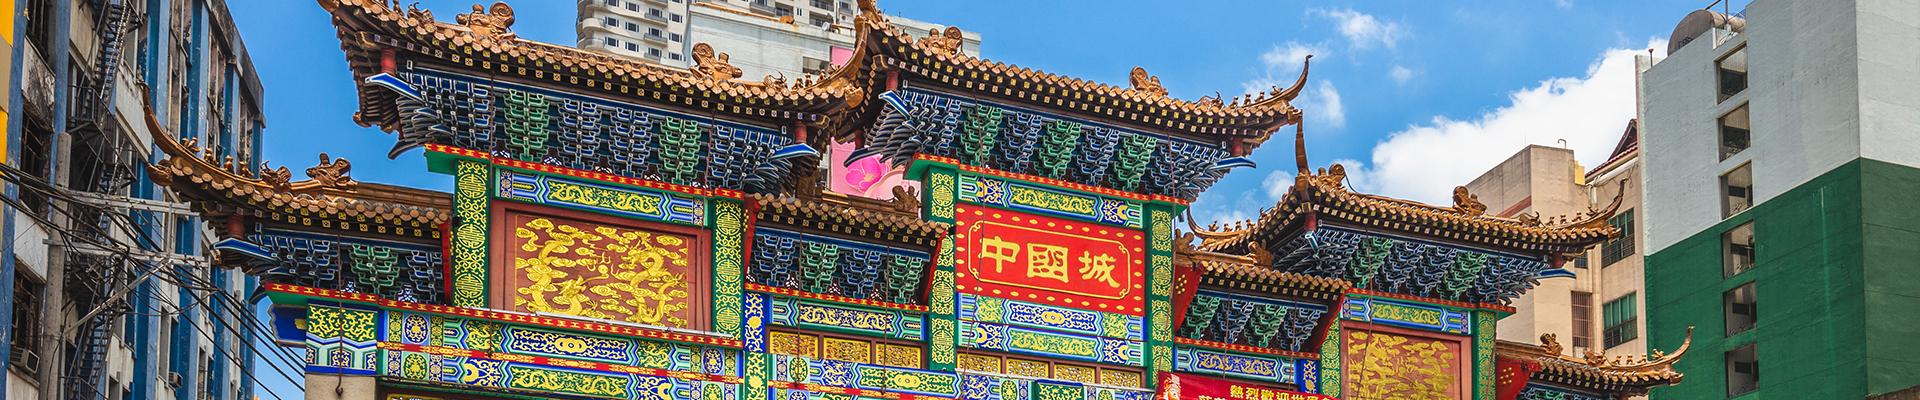 The worldest largest Chinatown Arch, Manila, Phillipines